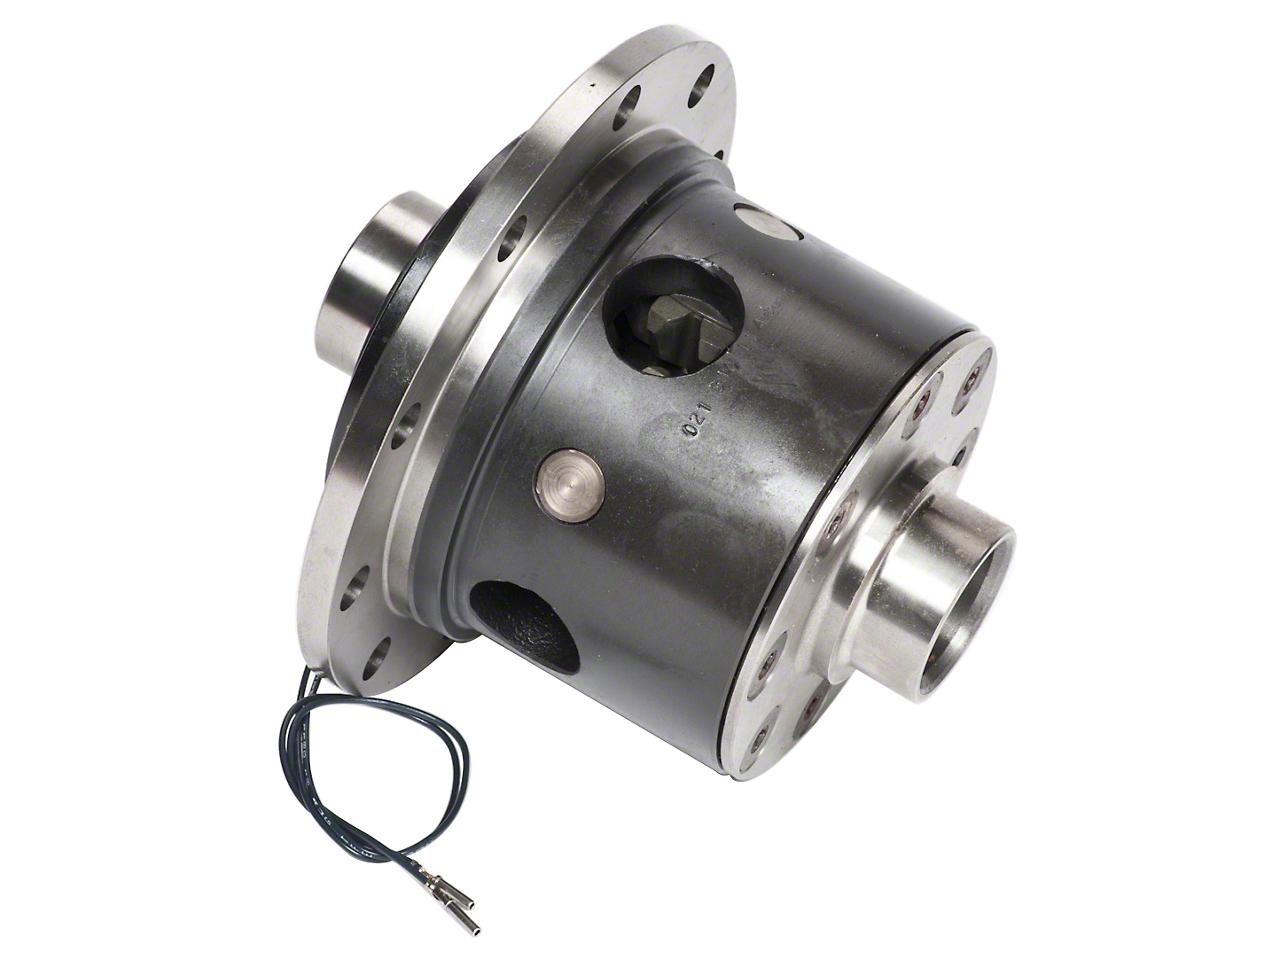 Auburn Gear Ected Max-Locker Differential - Dana 44 - 35 Spline - All Ratios (07-18 Wrangler JK Rubicon)